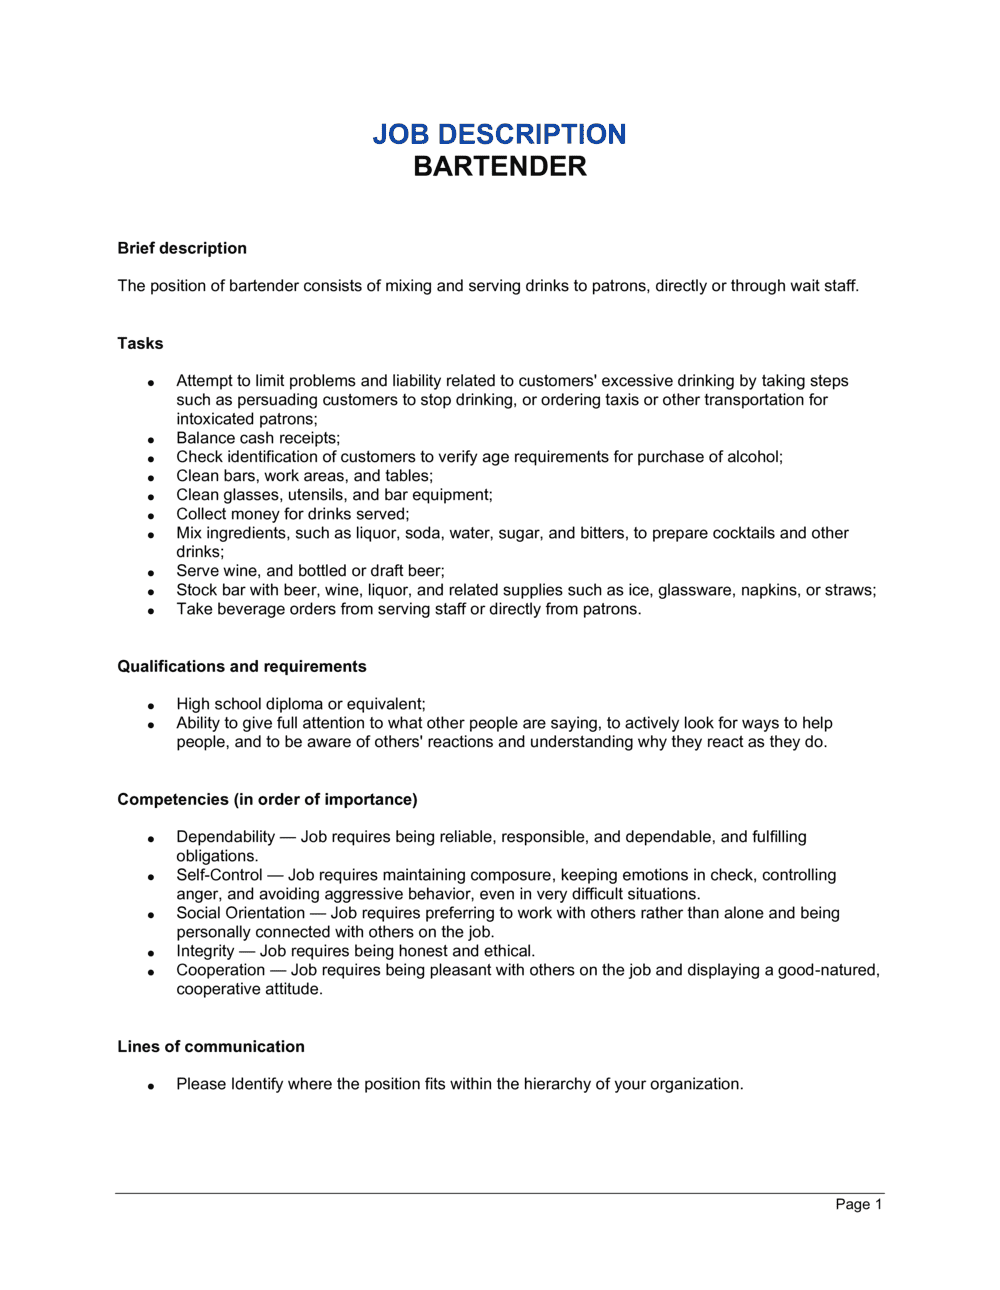 Business-in-a-Box's Bartender Job Description Template